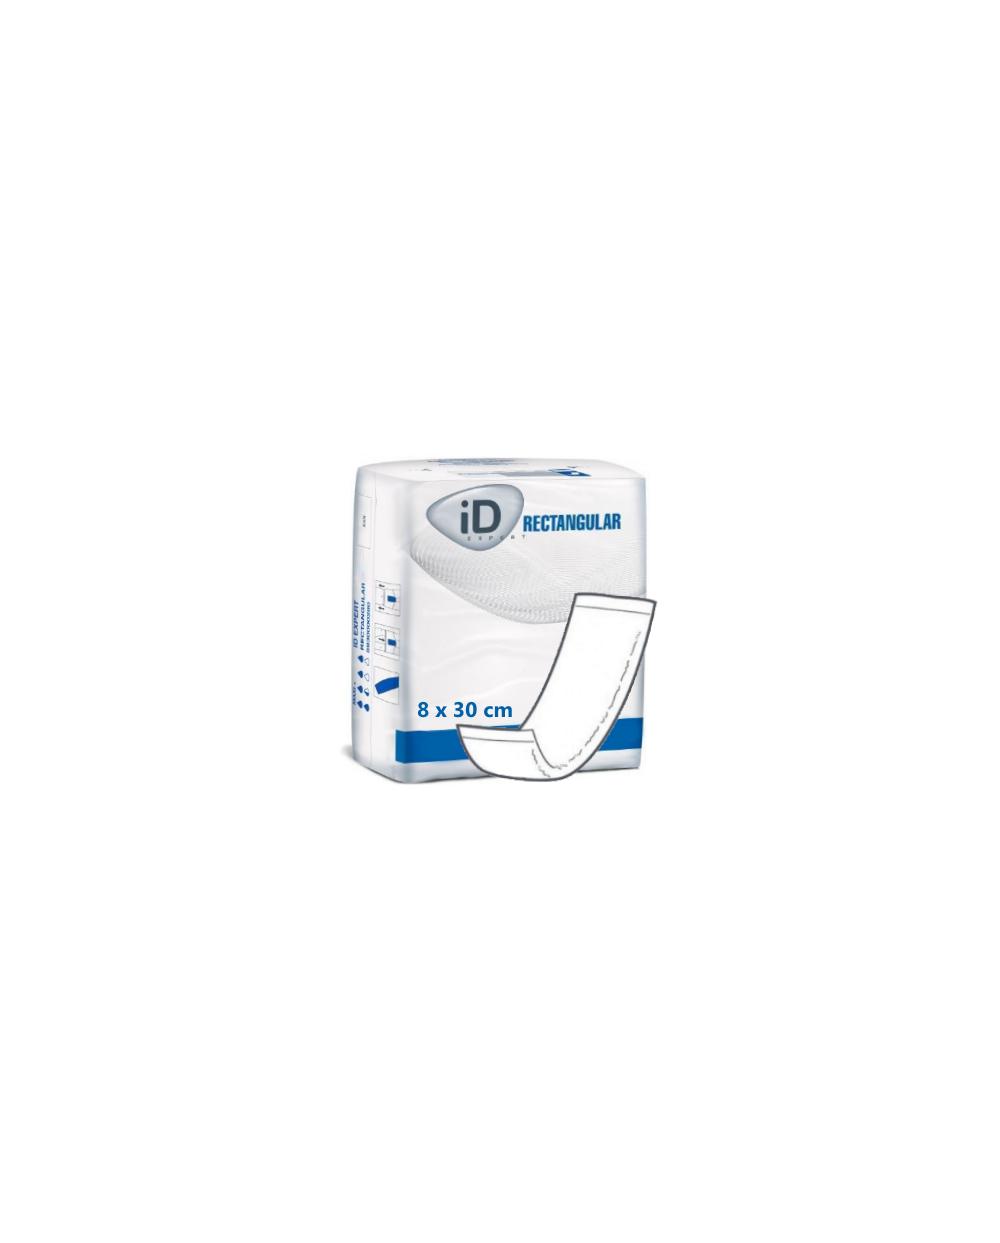 ID Expert Rectangular Intraversable PE 8 x 30 cm - 12 protections